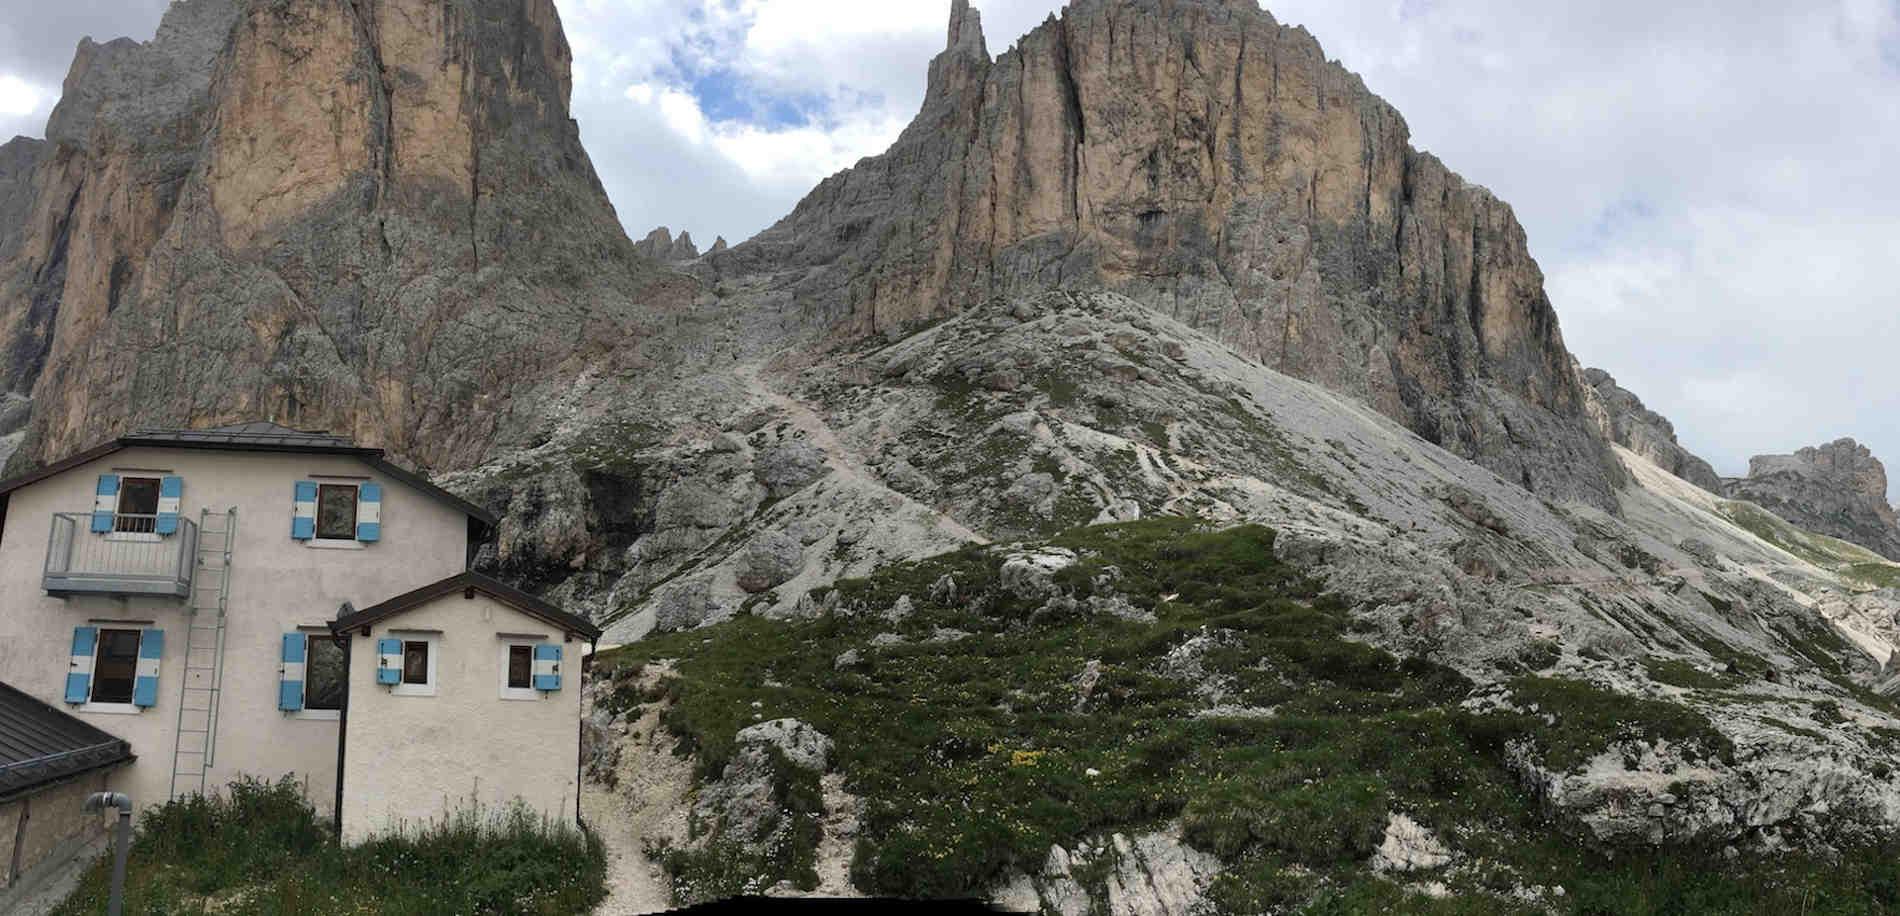 Sotto le Torri del Vajolet: in basso si notano i rifugi Vajolet e Preuss Fare fantastici trekking in Trentino Alto Adige sulle Dolomiti